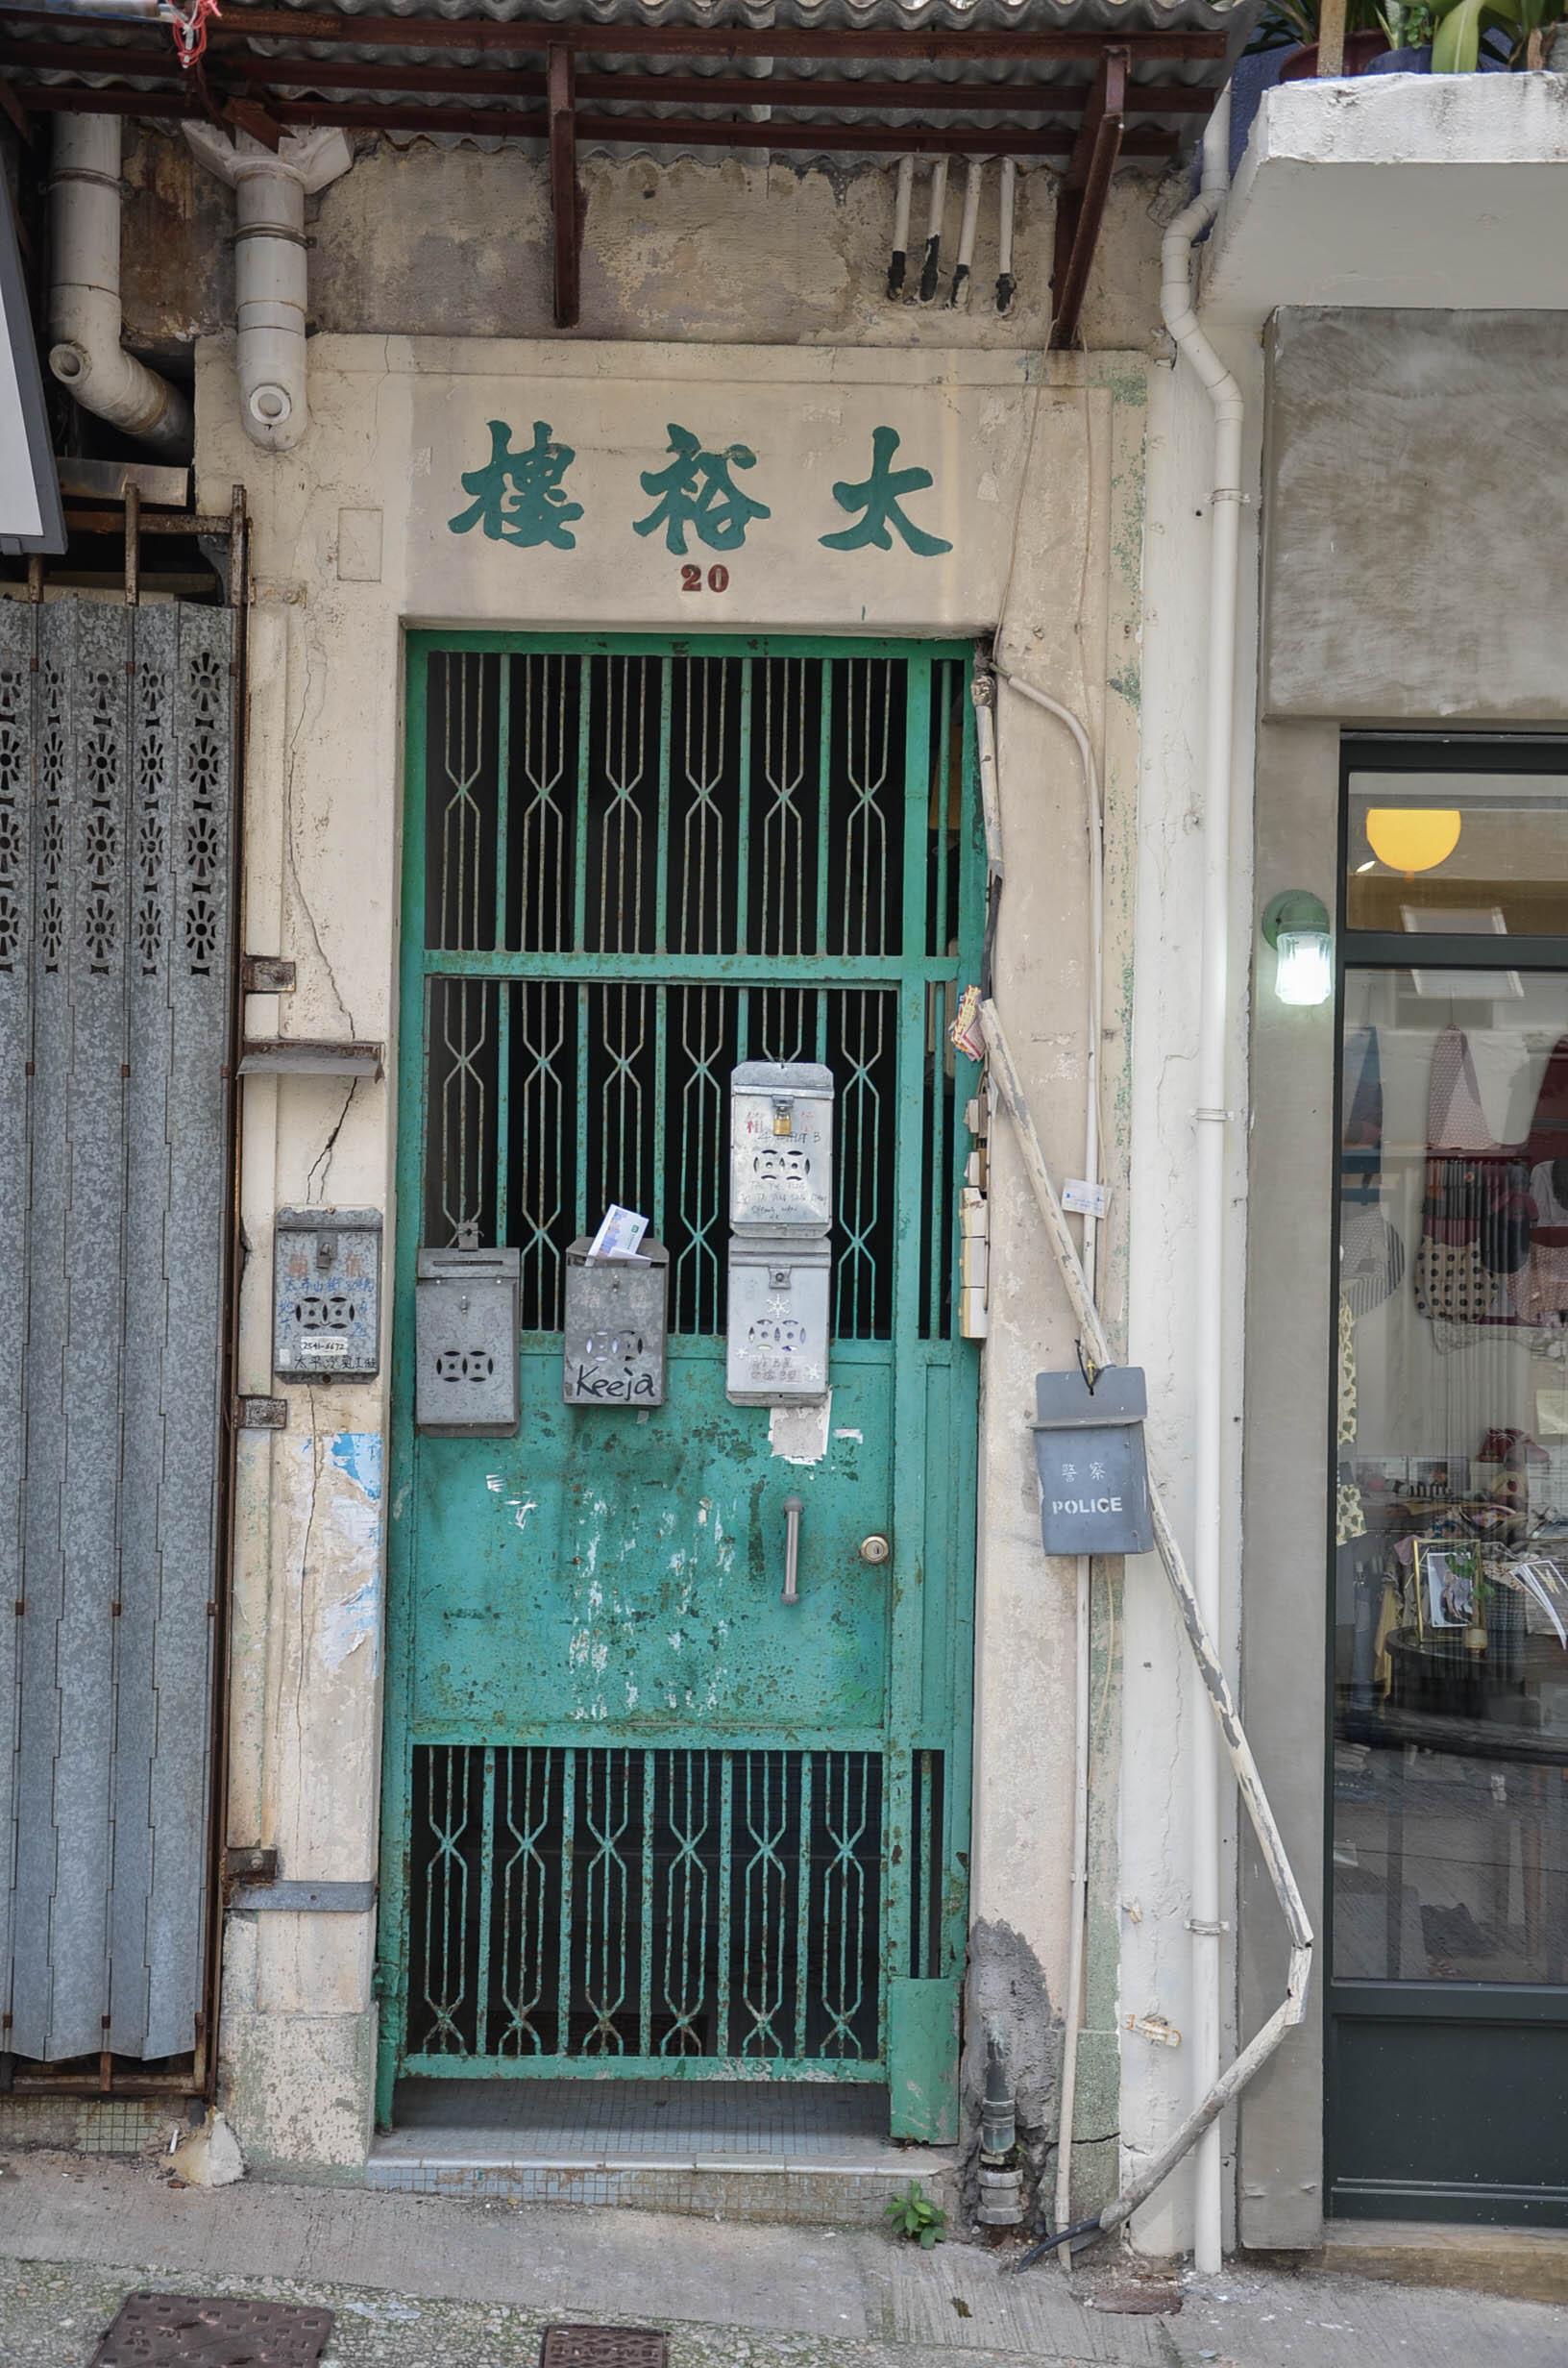 Hongkong Reisetipps: Die Taxis finden (fast) jede Adresse in Hongkong